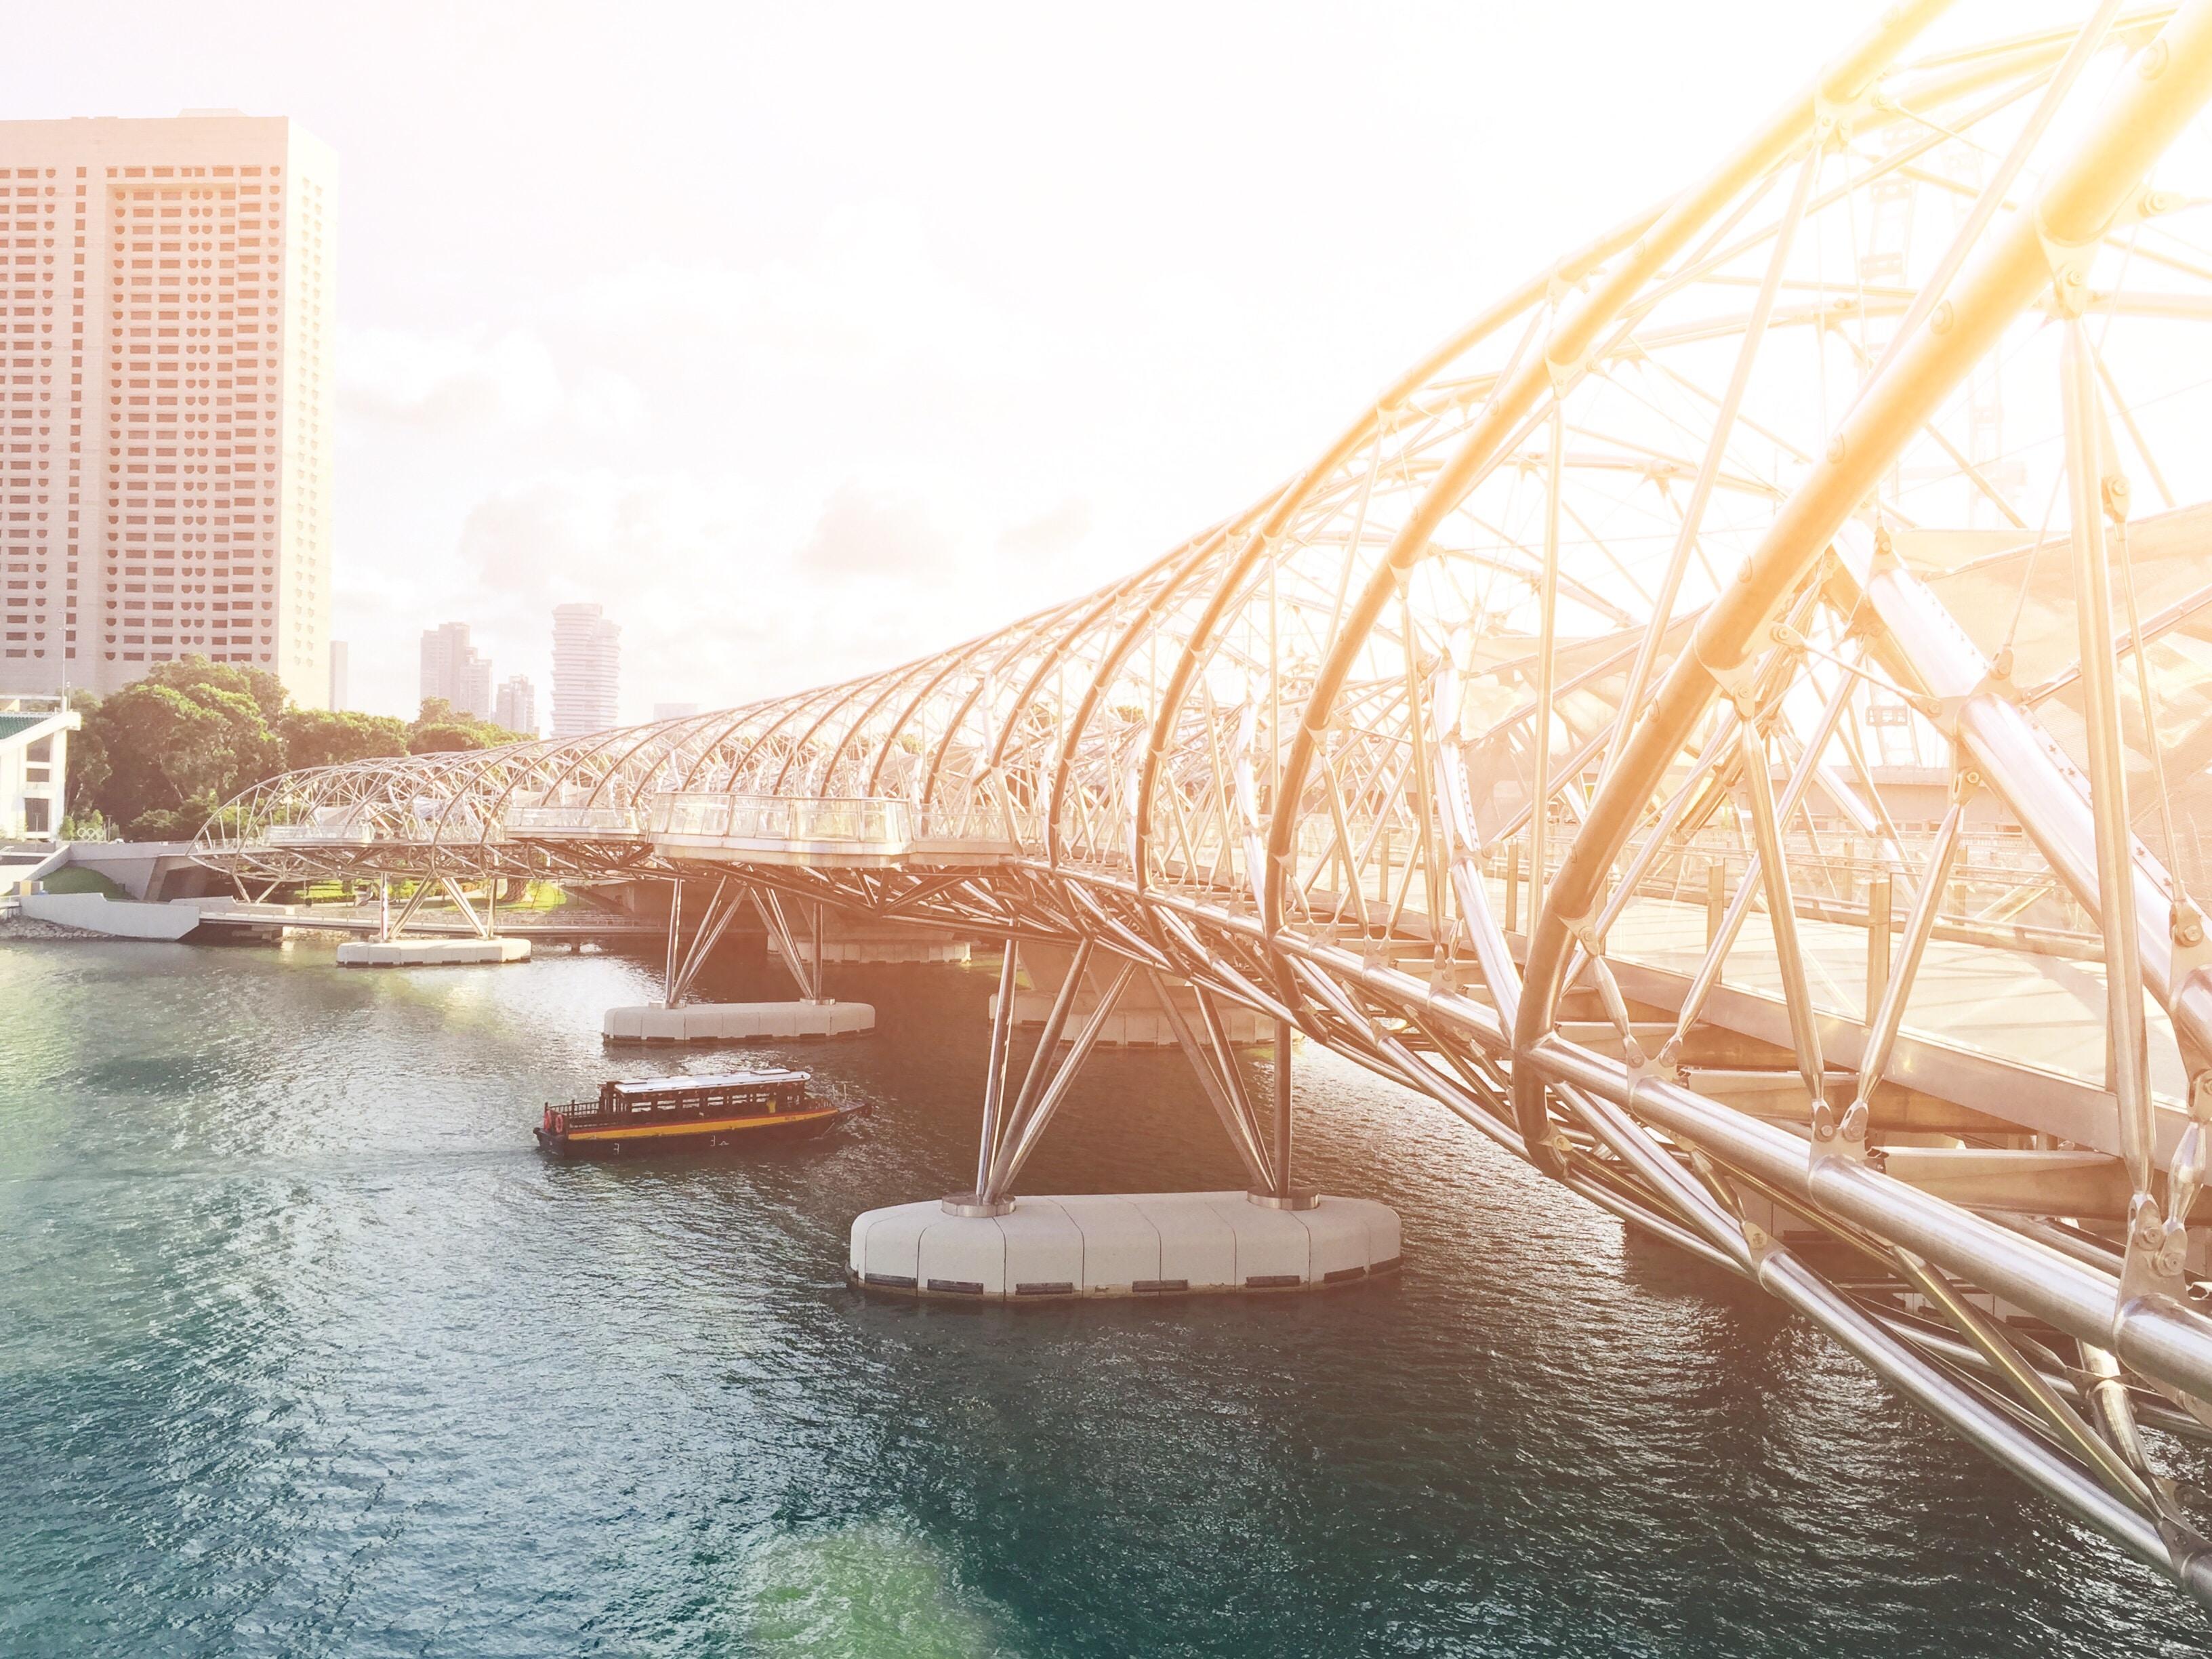 brown boat under gray full-suspension bridge near white concrete building at daytime